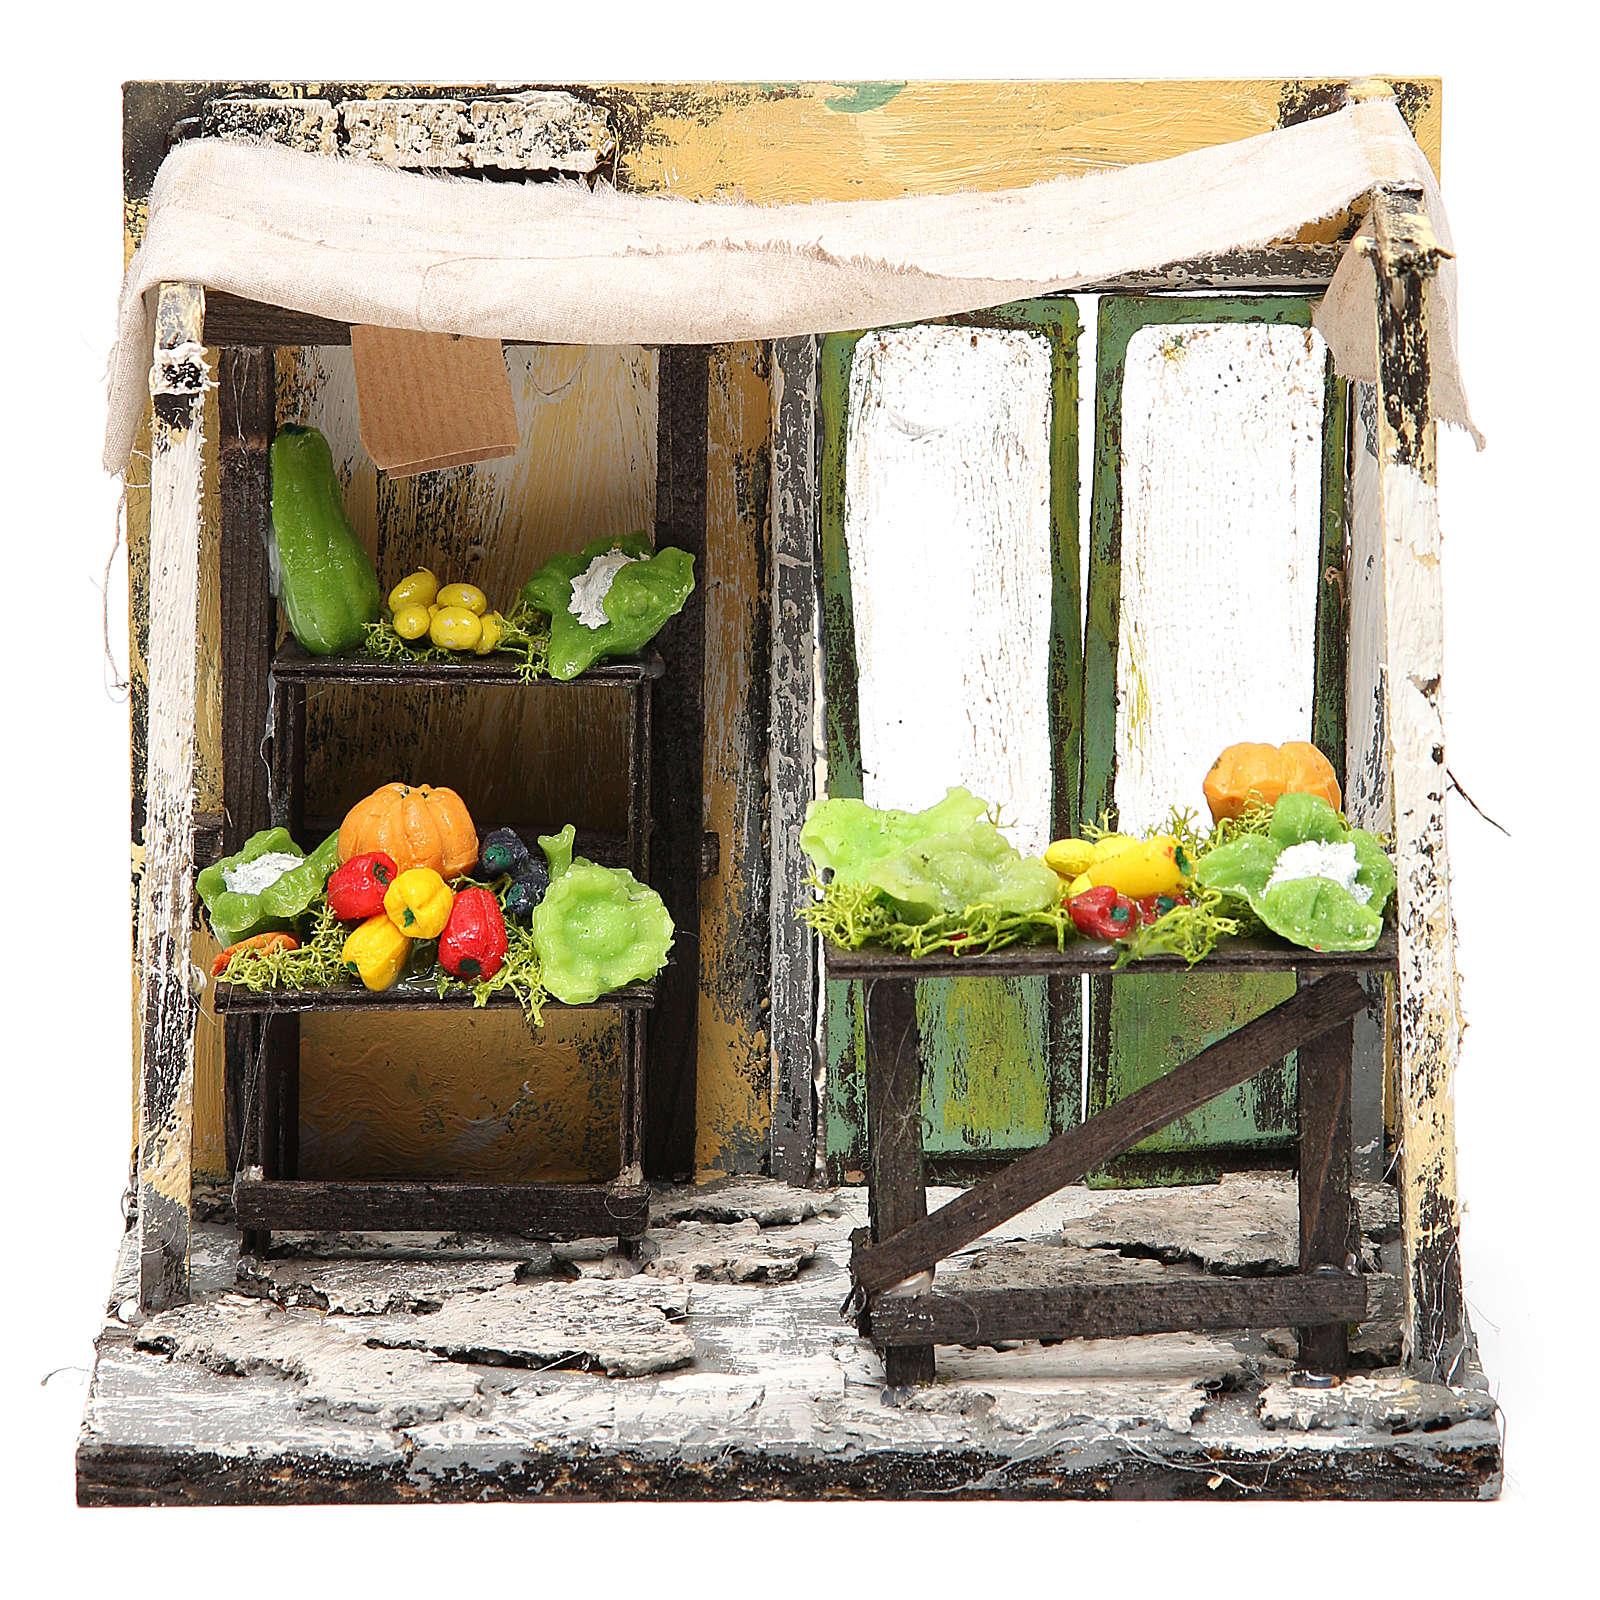 Bottega fruttivendolo in cera presepe  18x20x14 cm 4